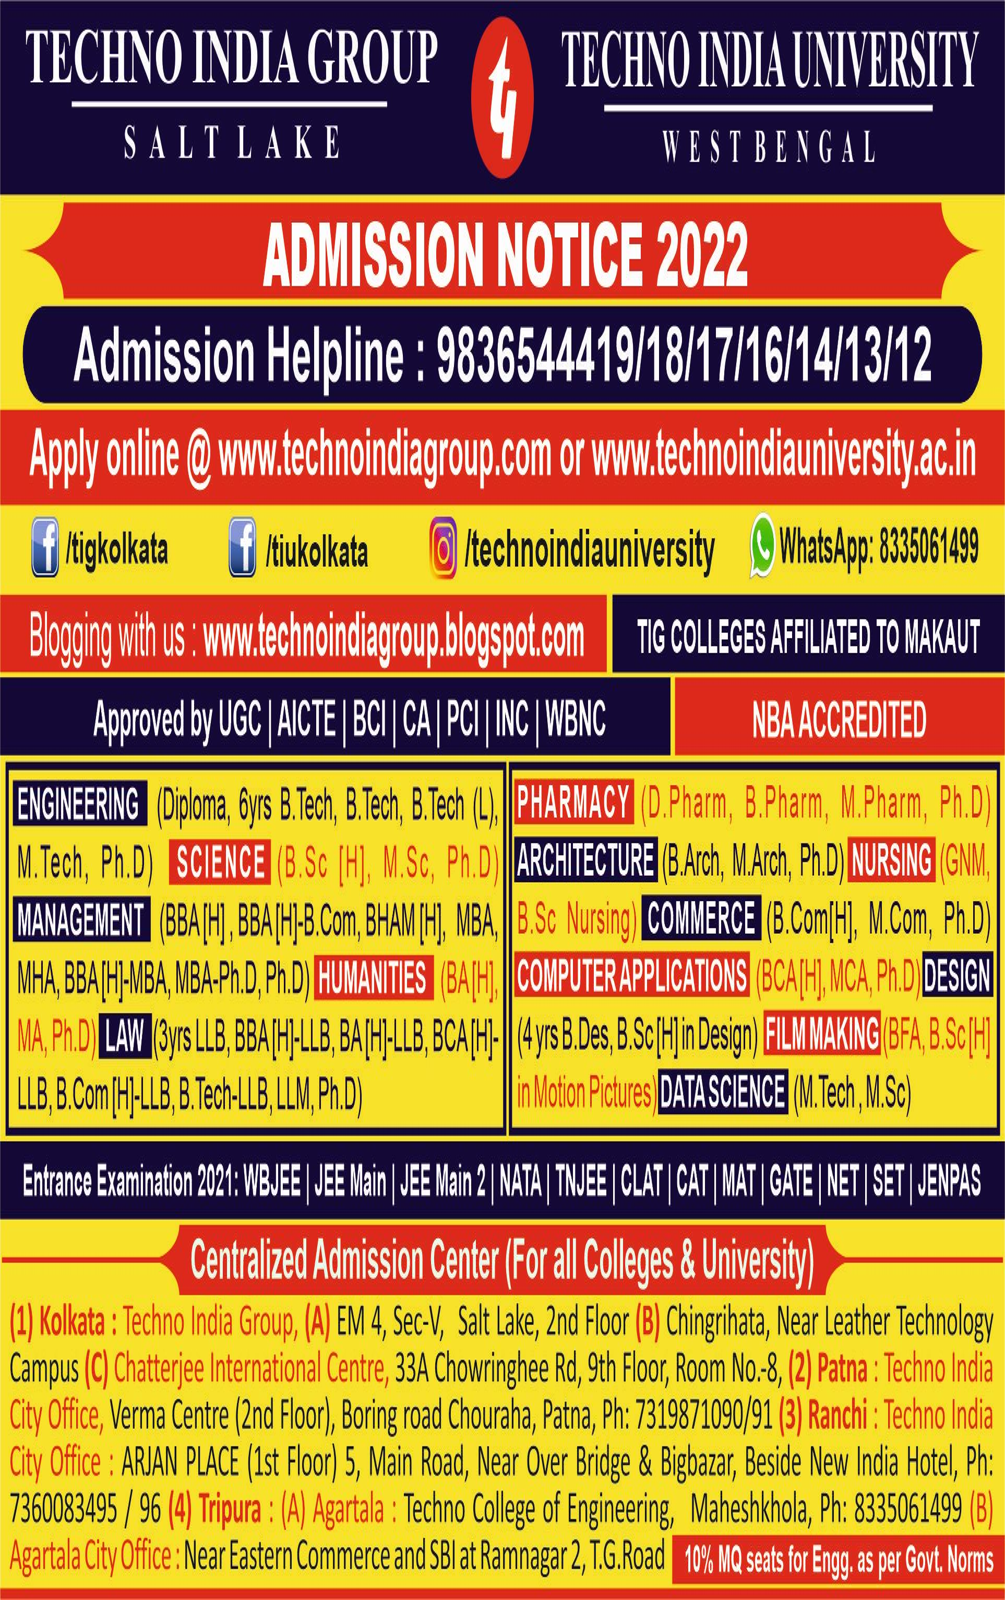 TIU, One of the best University in Asia ~